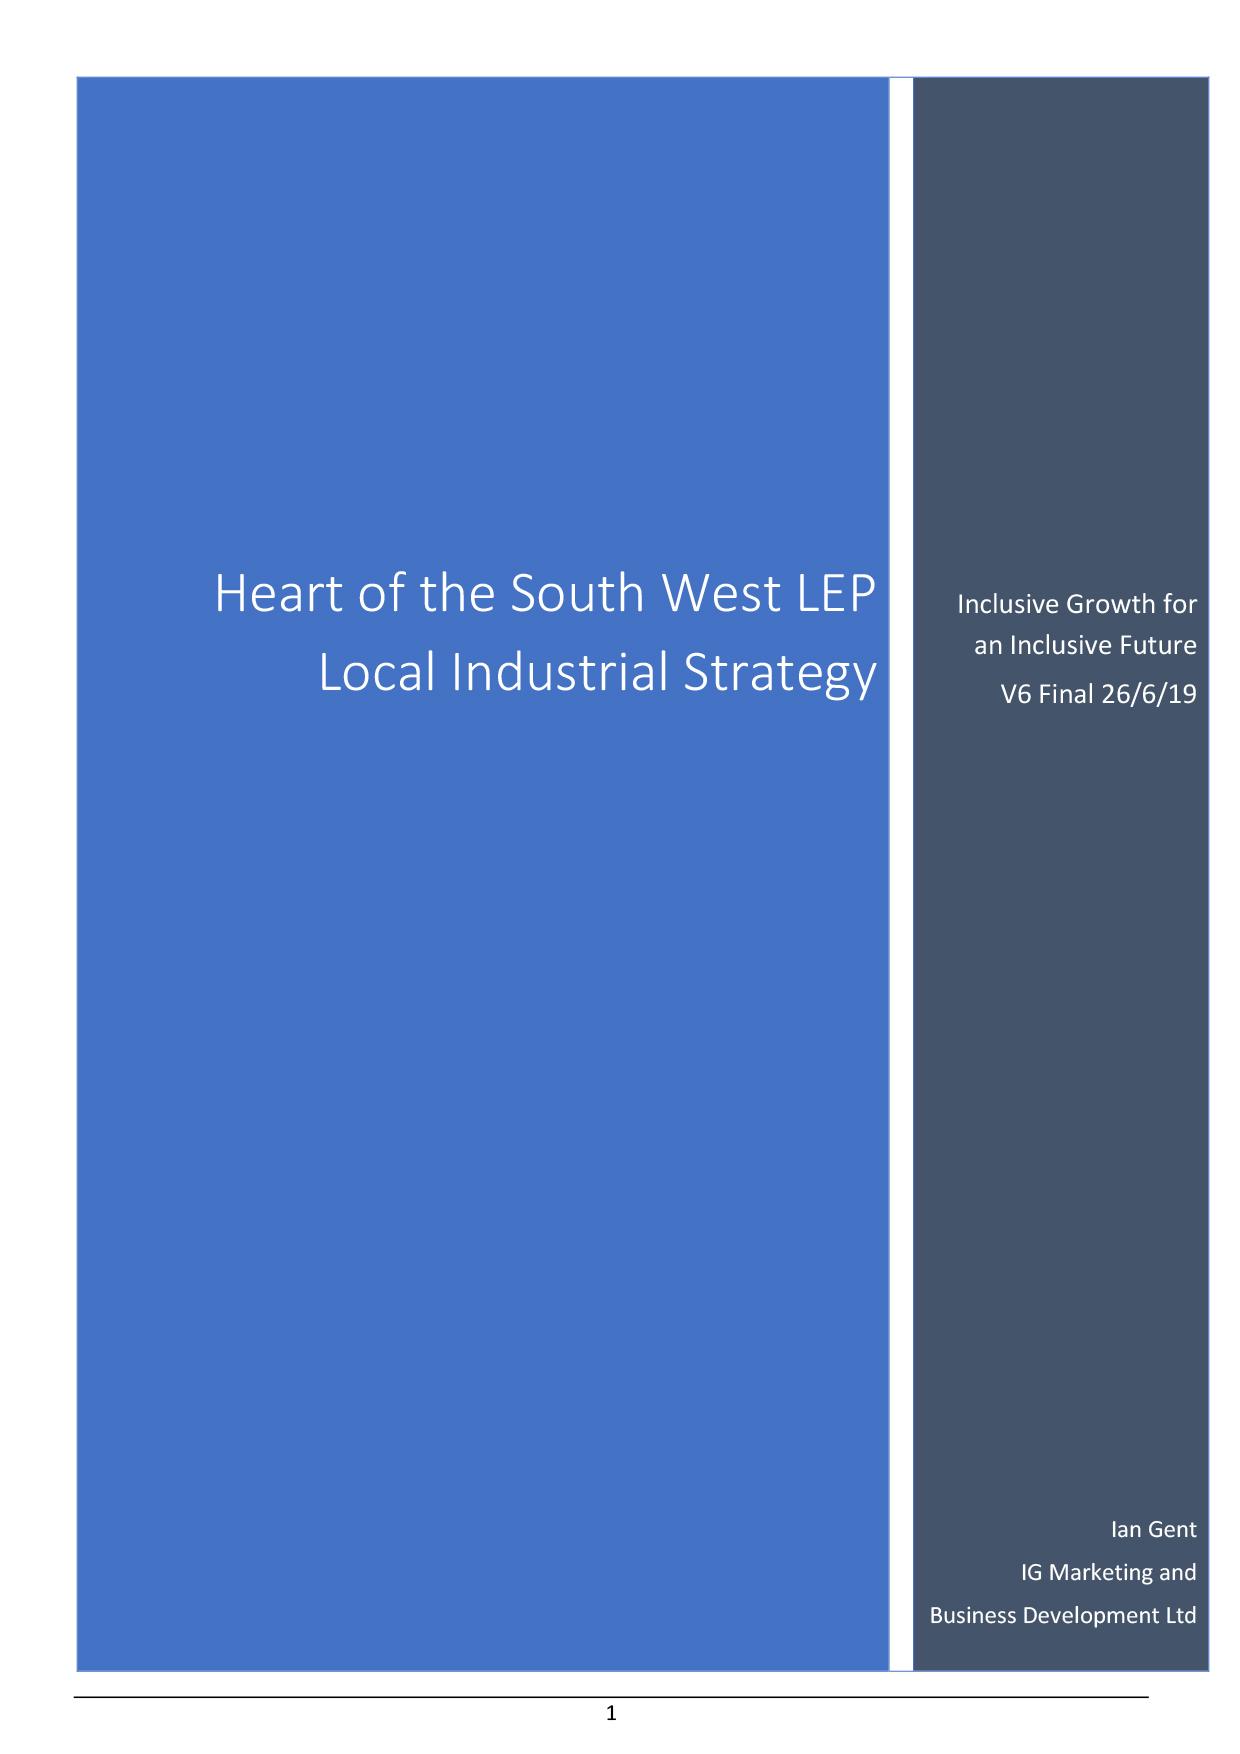 HotSW-Inclusive-Growth-Report-June-2019